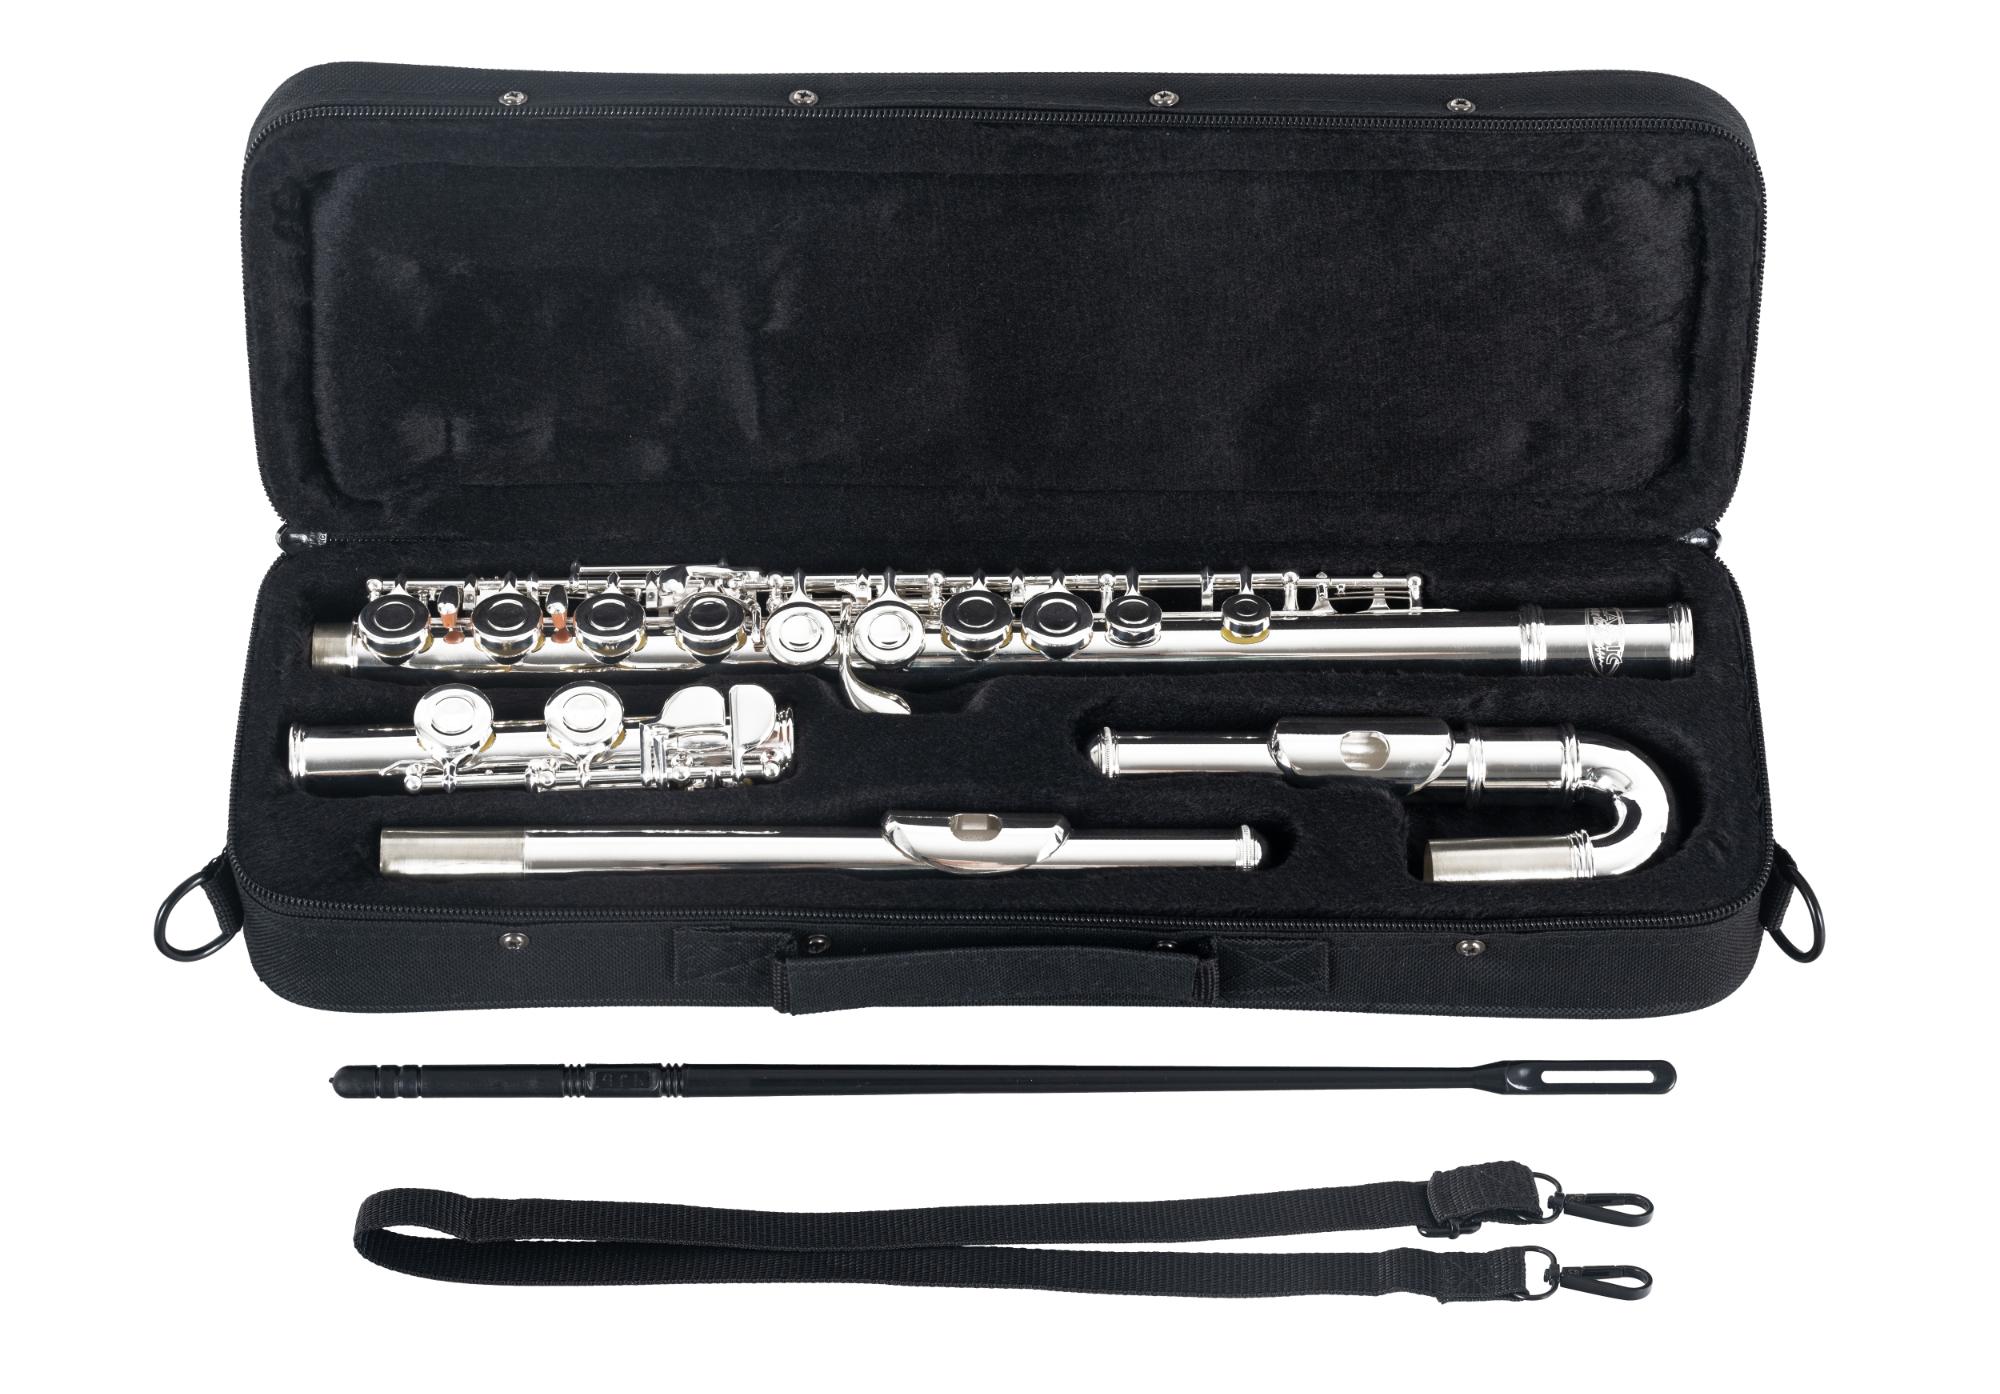 Classic Cantabile FL-200 Querflöte Flöte E-Mechanik Neusilber Wischerstab Etui